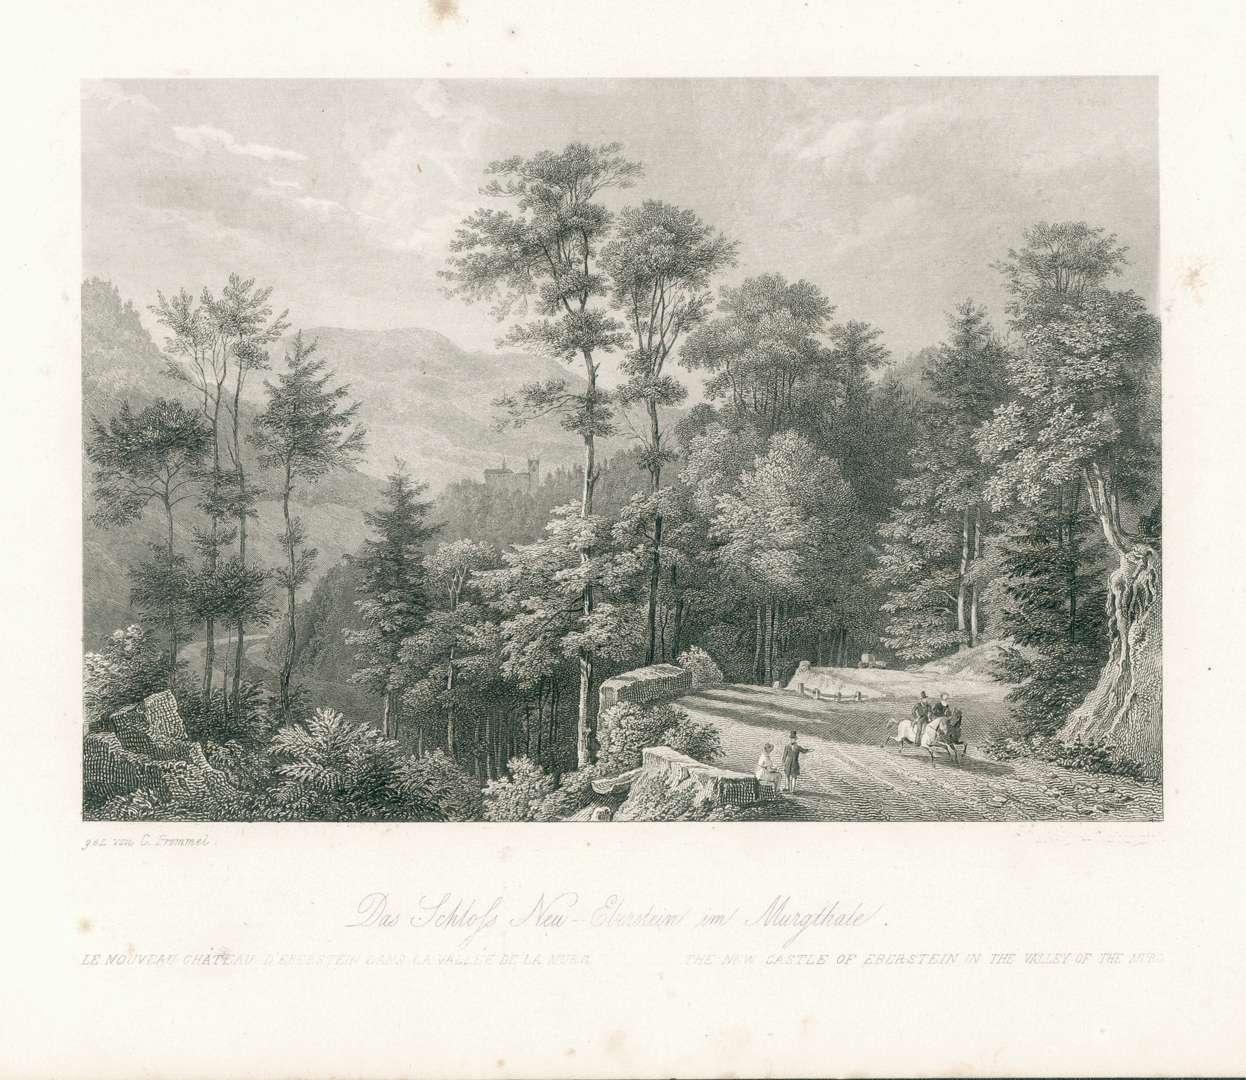 Das Schloss Neu-Eberstein im Murgthale., Bild 1